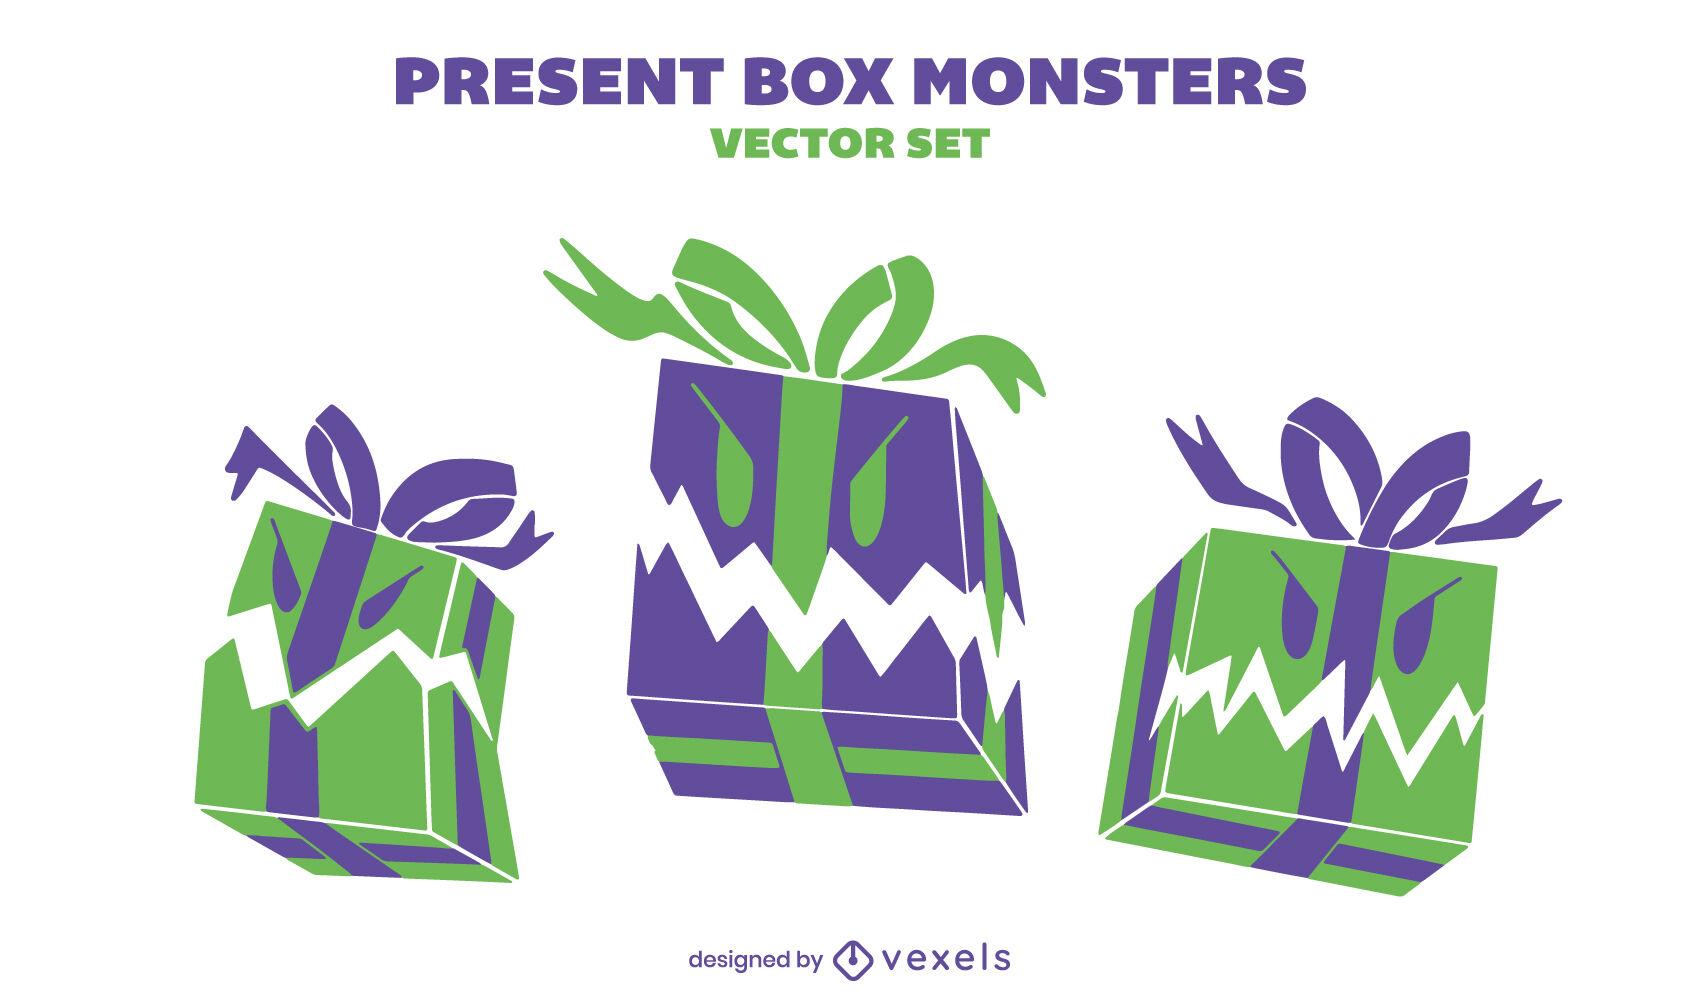 Monstruo de caja de regalo enojado presenta tr?o set